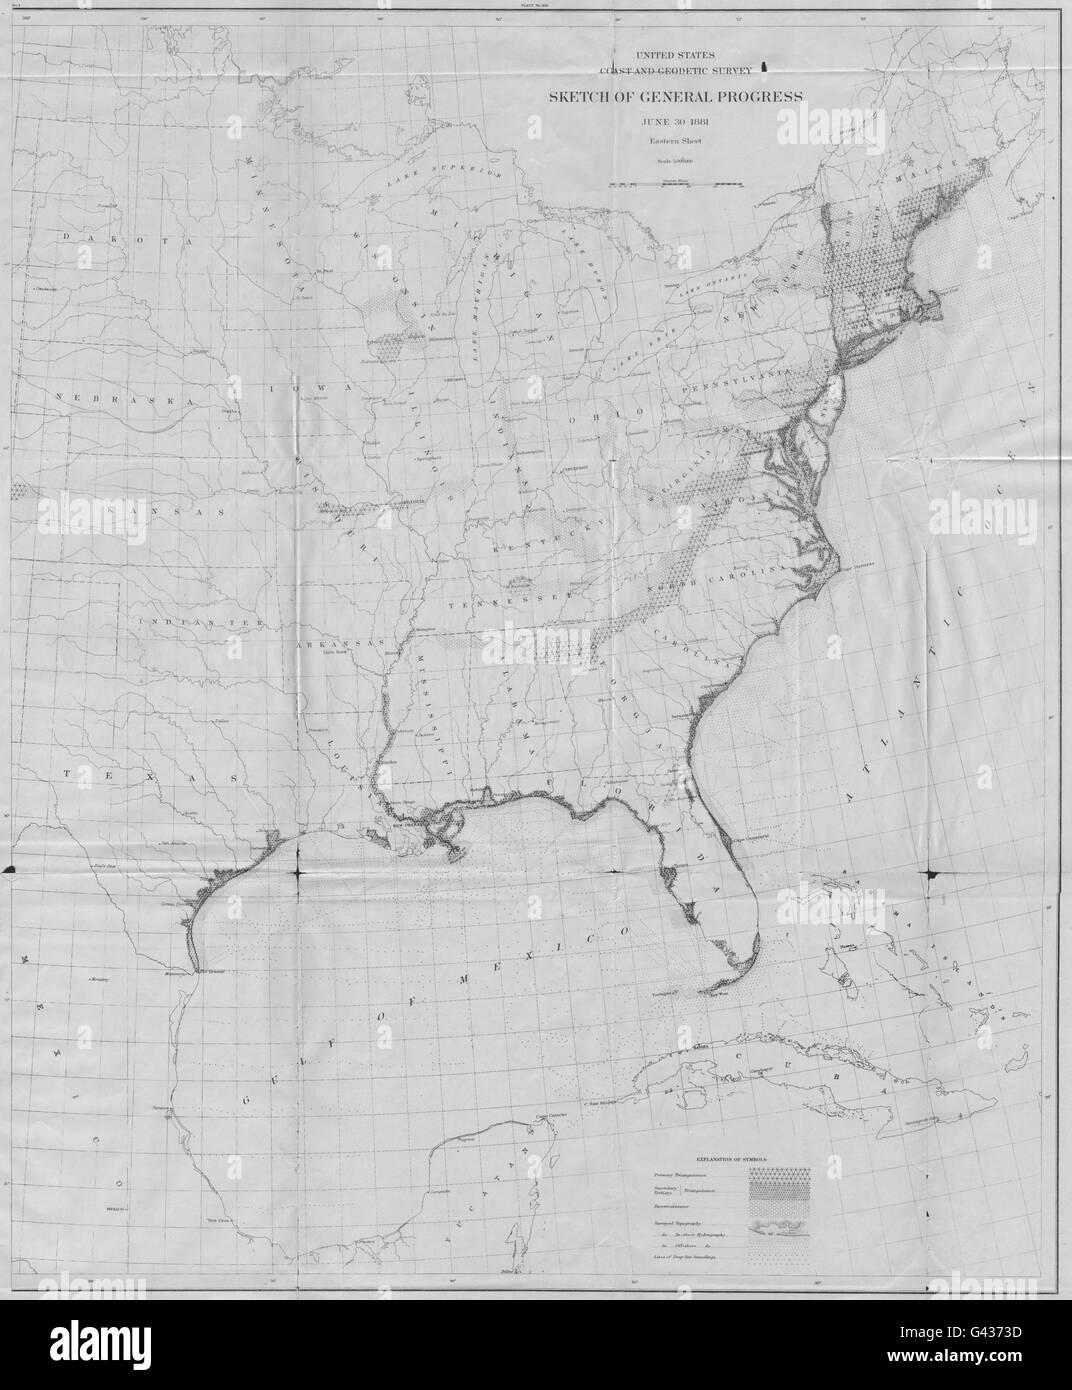 USA USCGS US Coastal Geodetic Survey Eastern Sheet - Us coast and geodetic survey maps